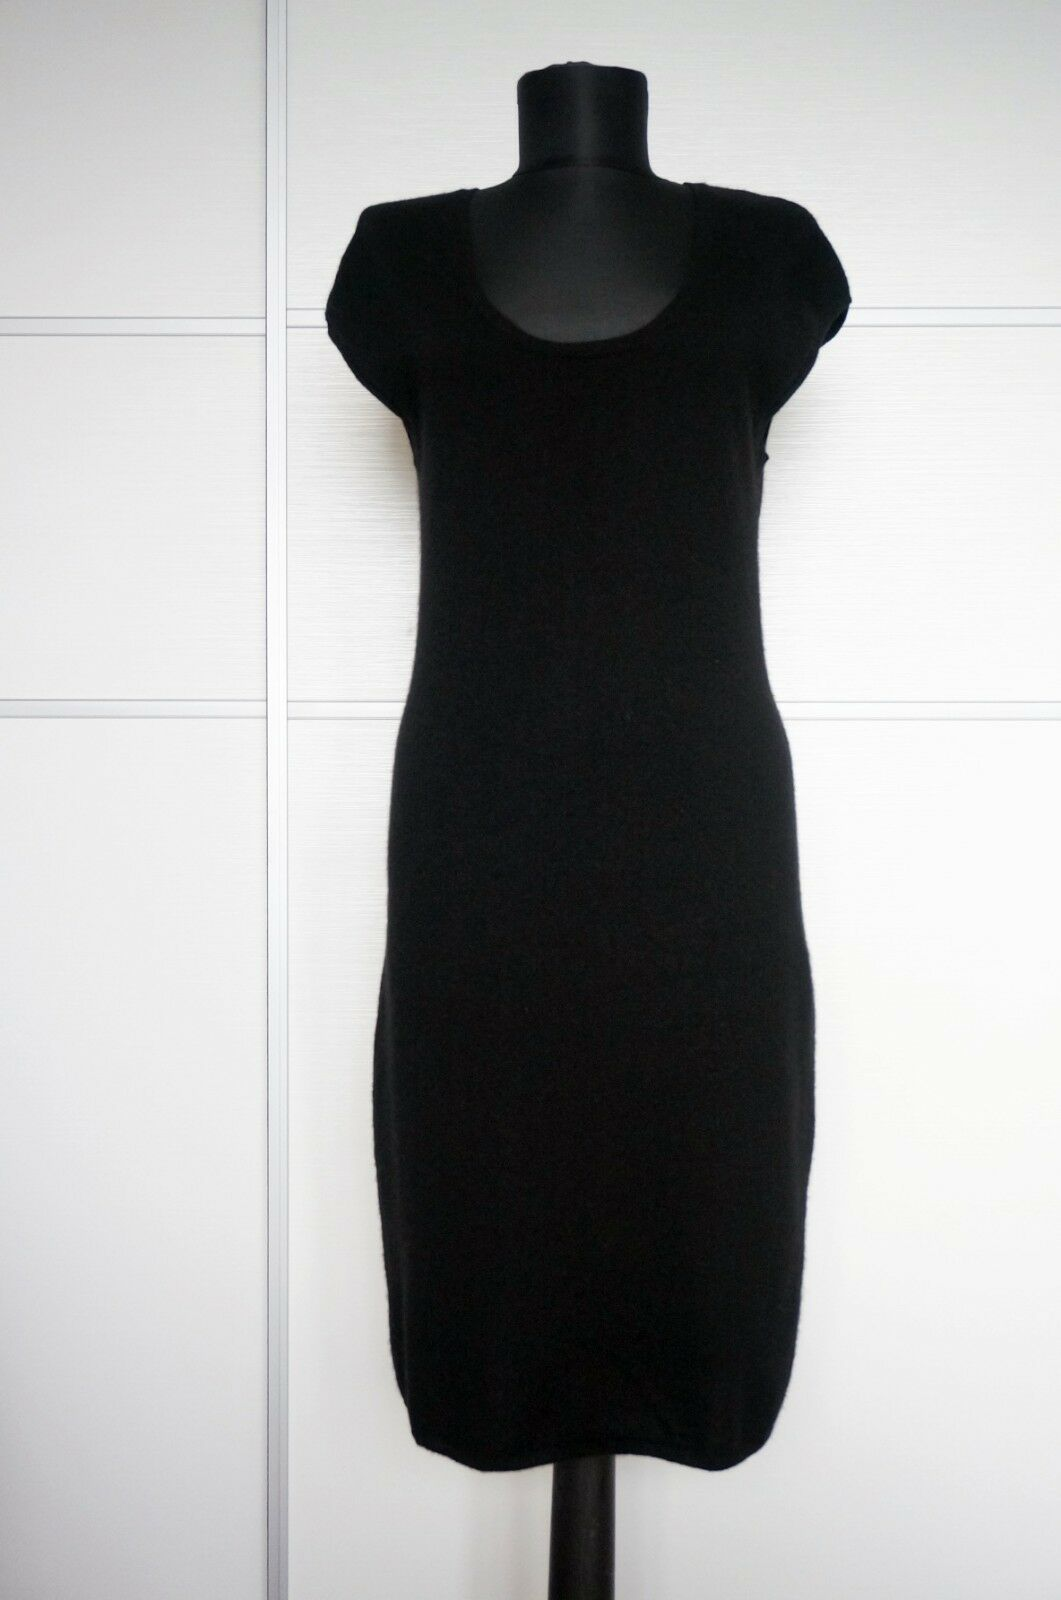 Gerto Oslo 100% Cashmere schwarz Dress, Größe S